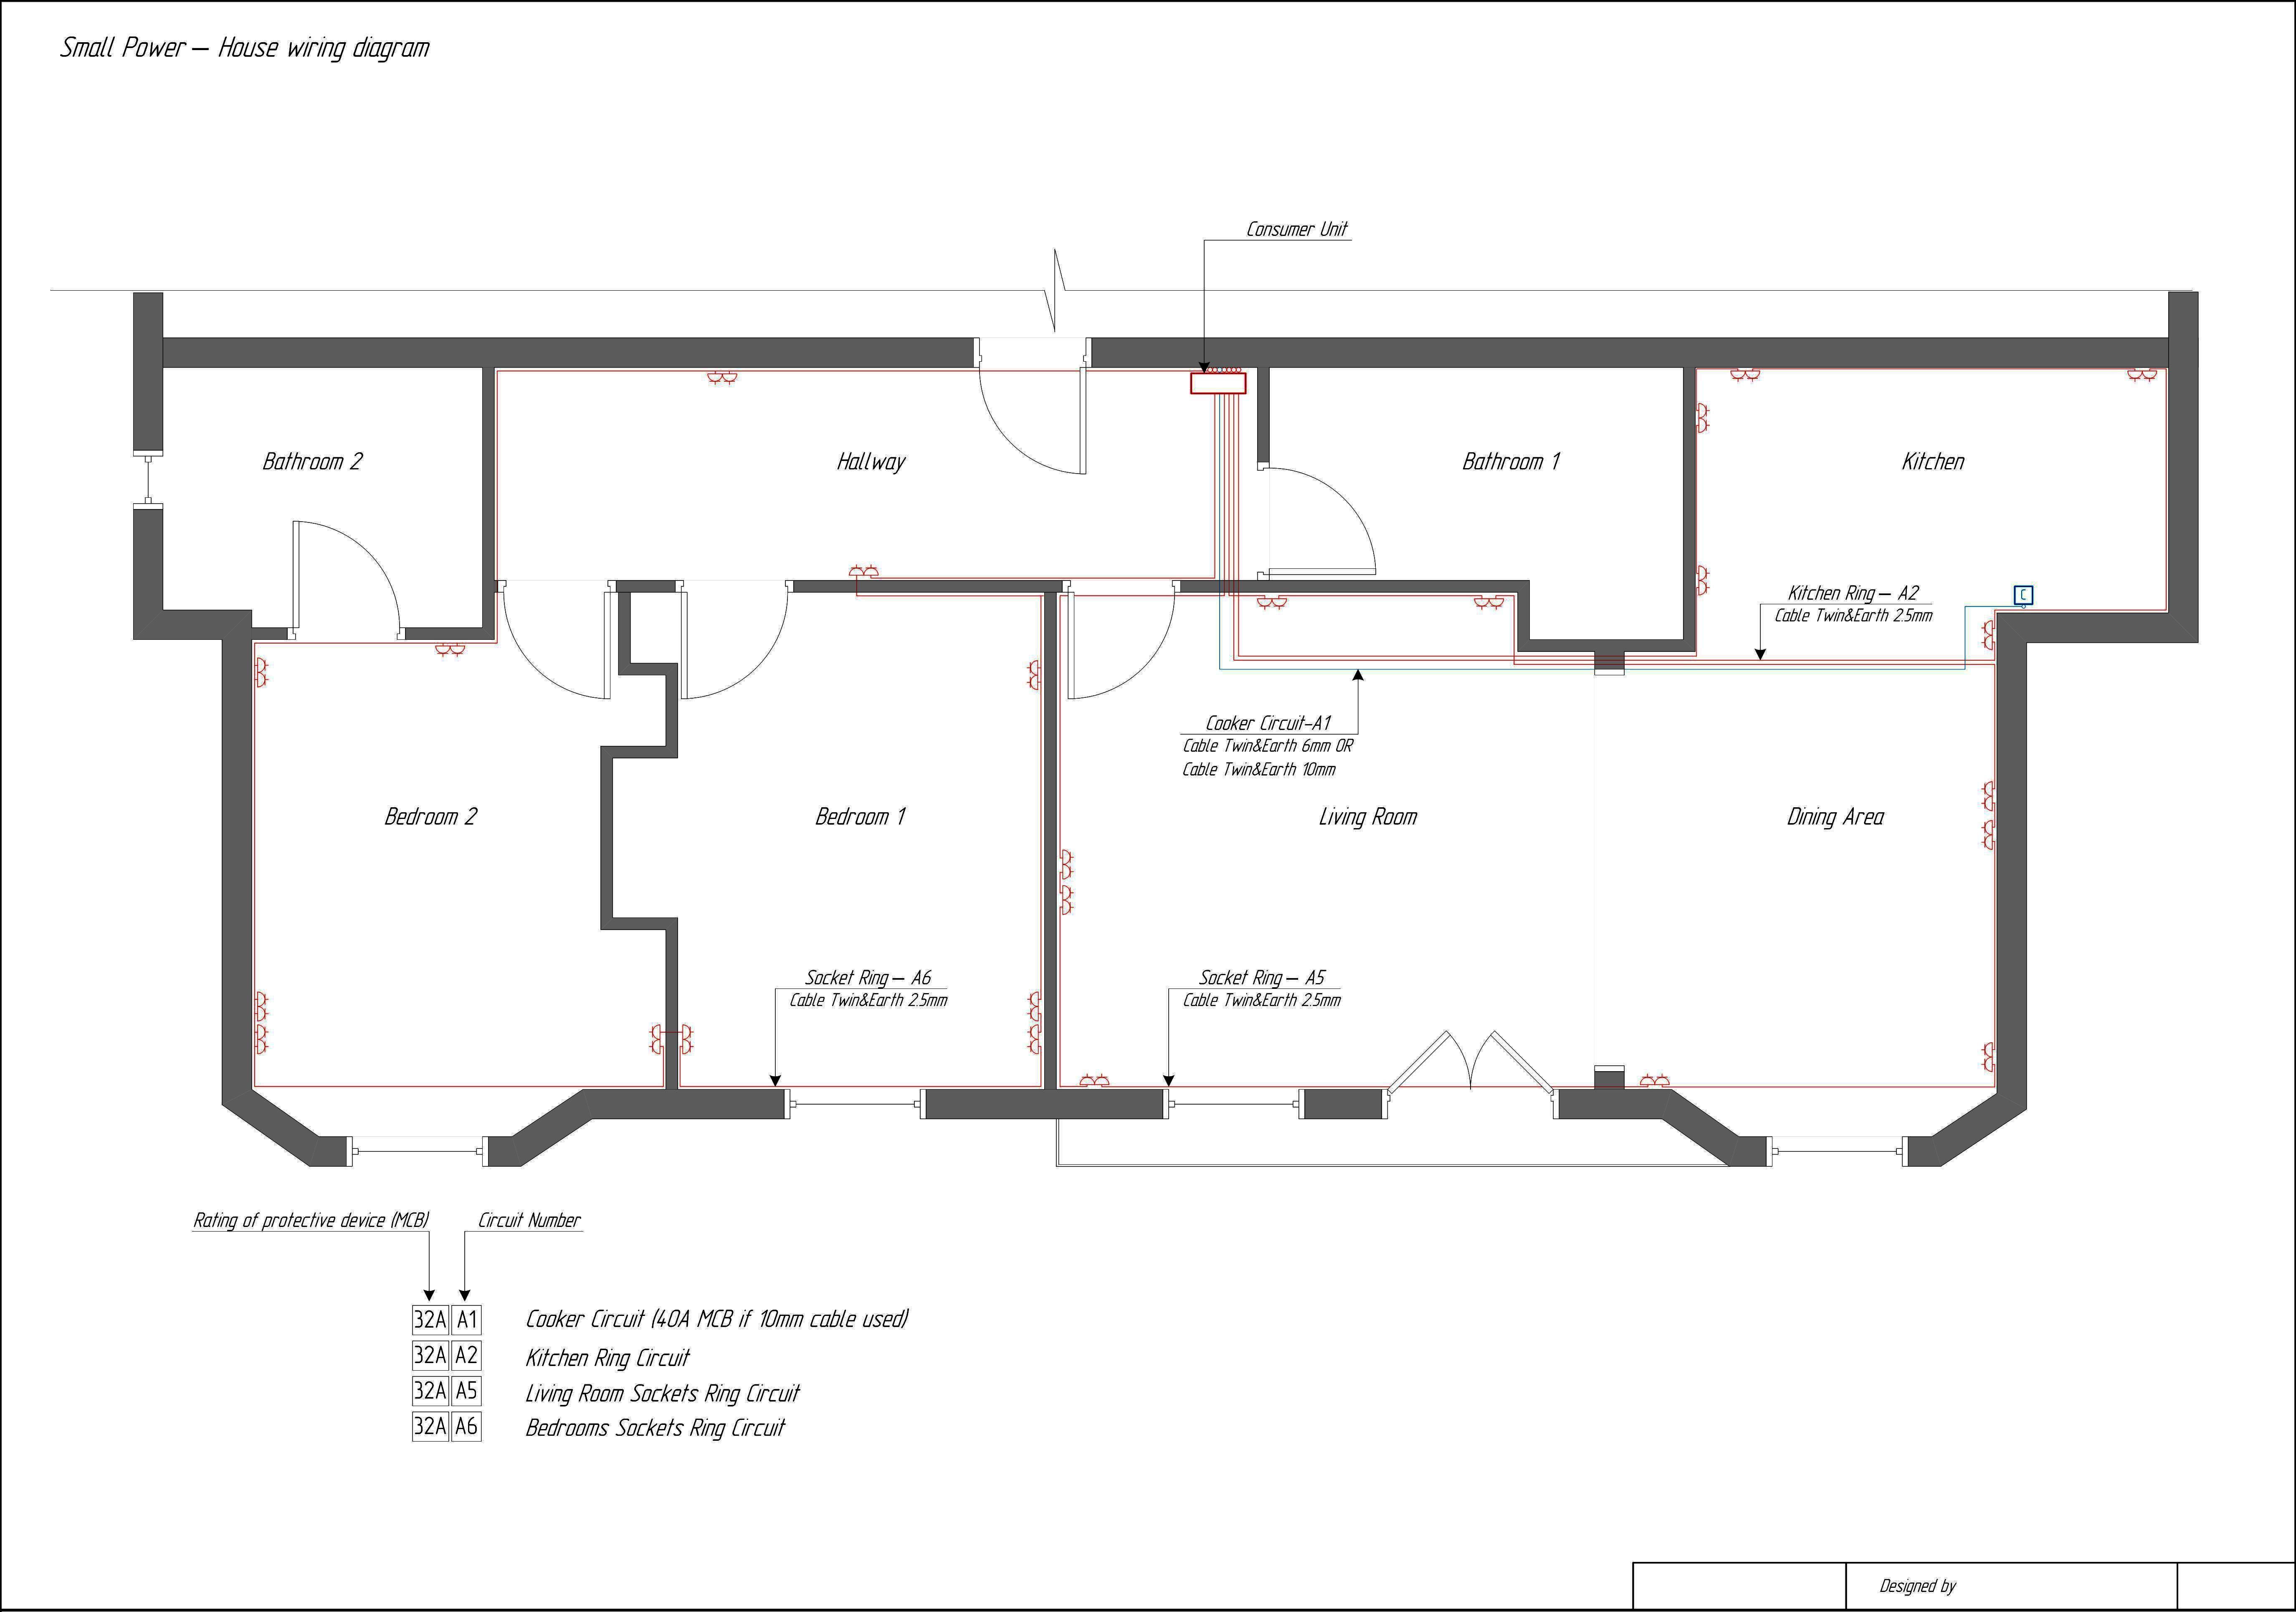 Electrical Circuit Diagram House Wiring